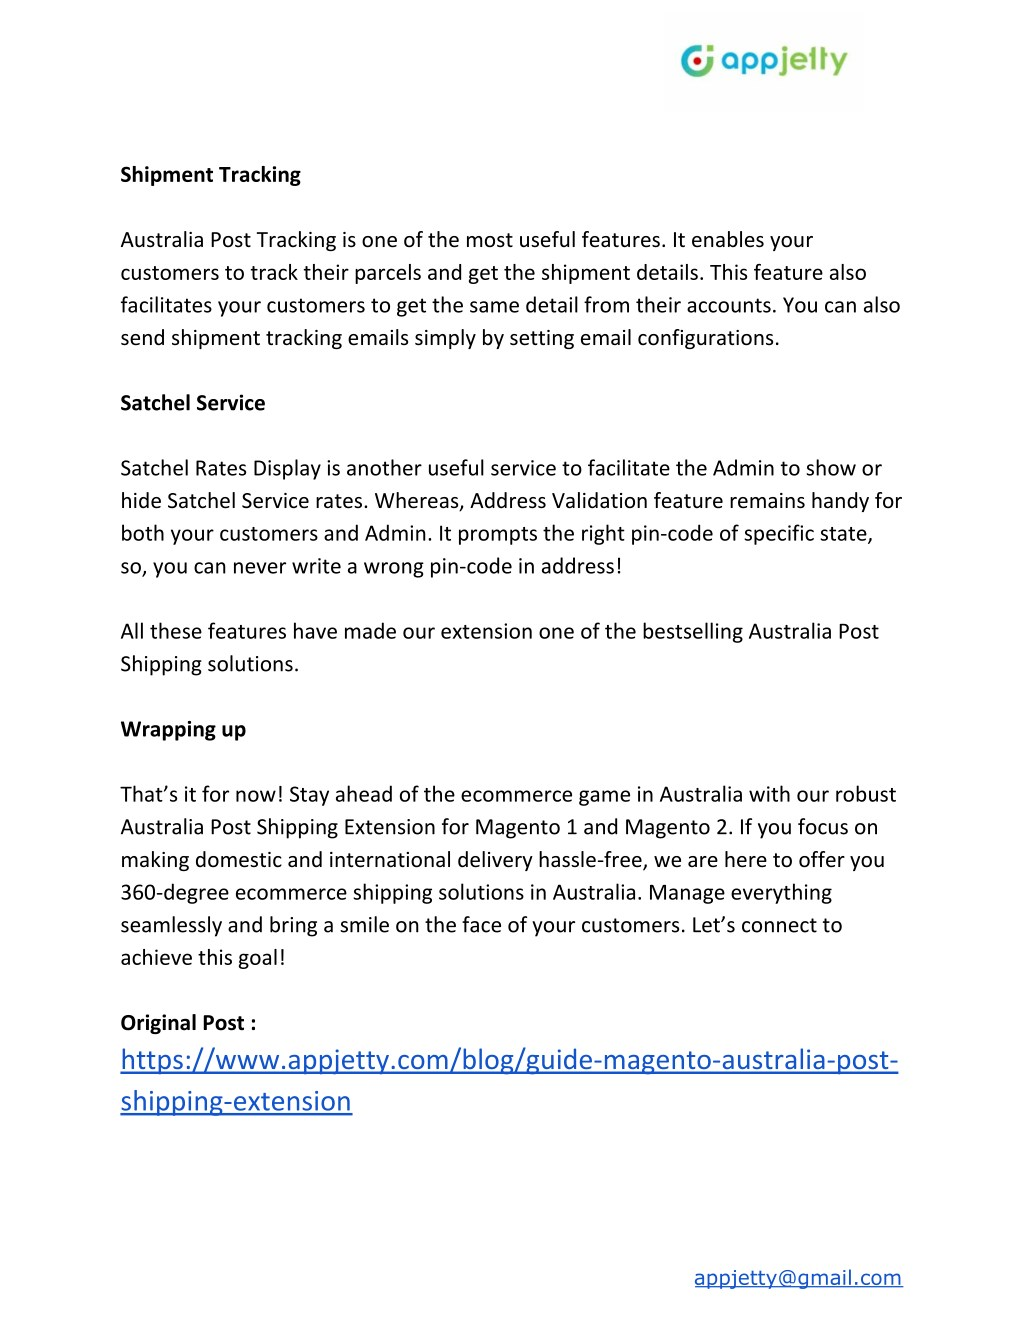 PPT - Your Comprehensive Guide to Magento 1 & 2 Australia